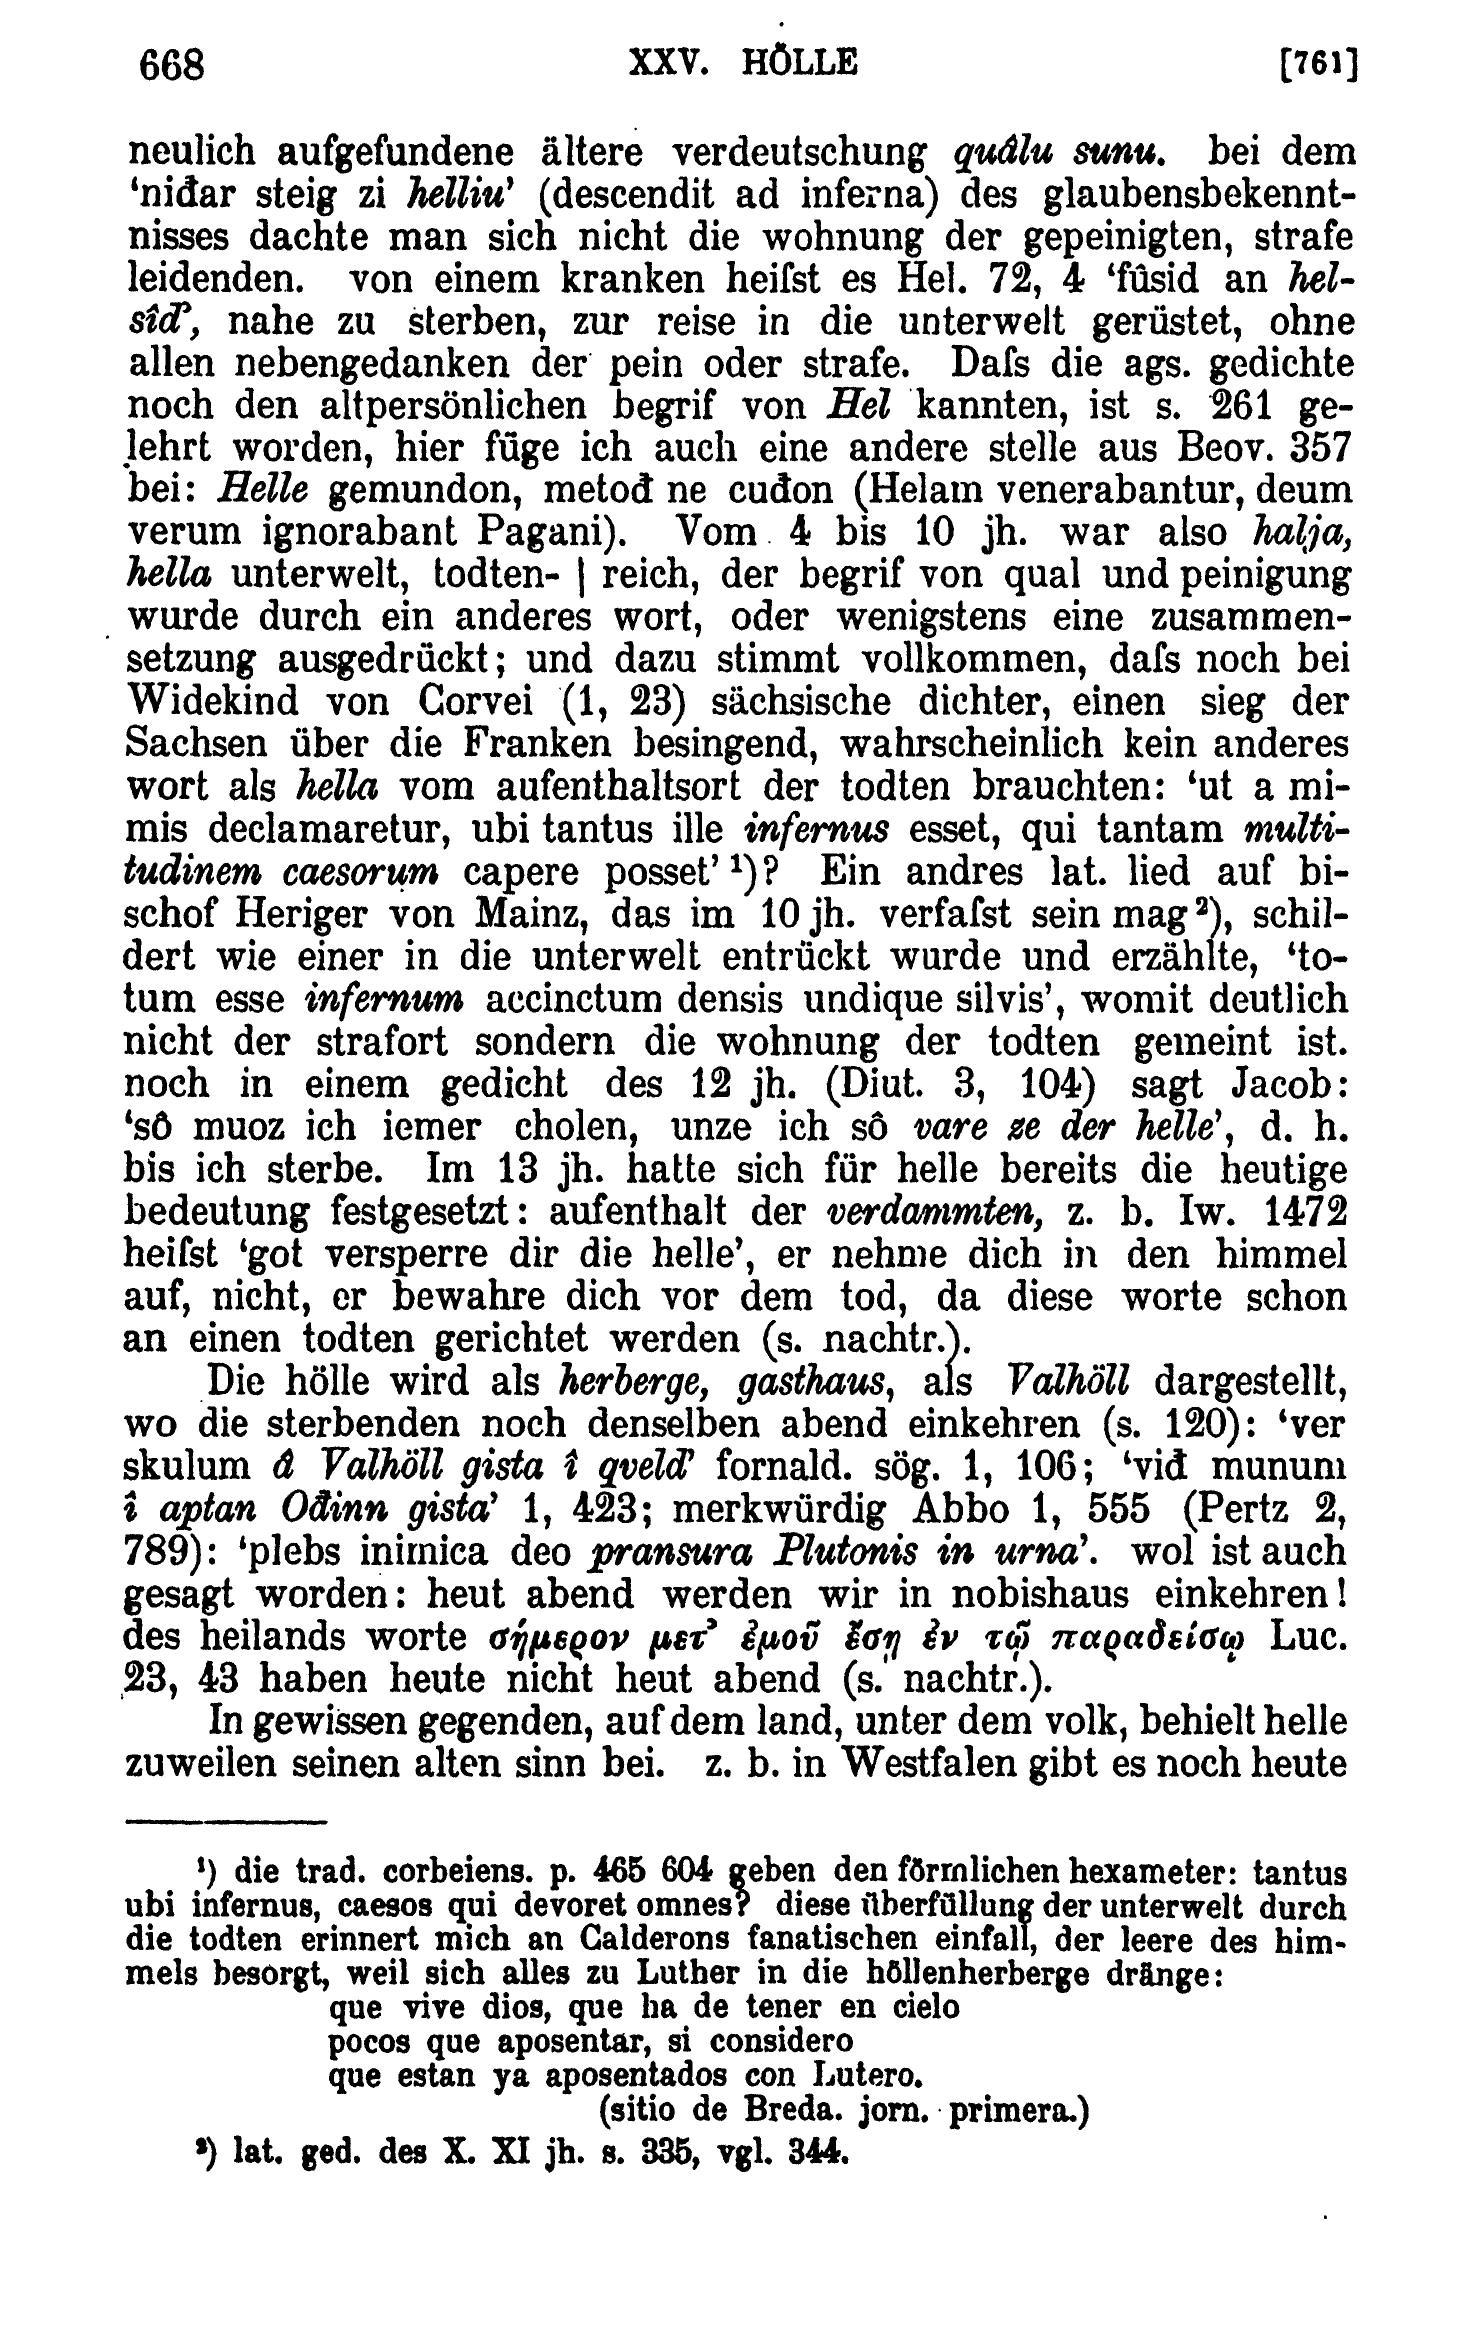 File:Deutsche Mythologie (Grimm) V2 132.jpg - Wikimedia Commons